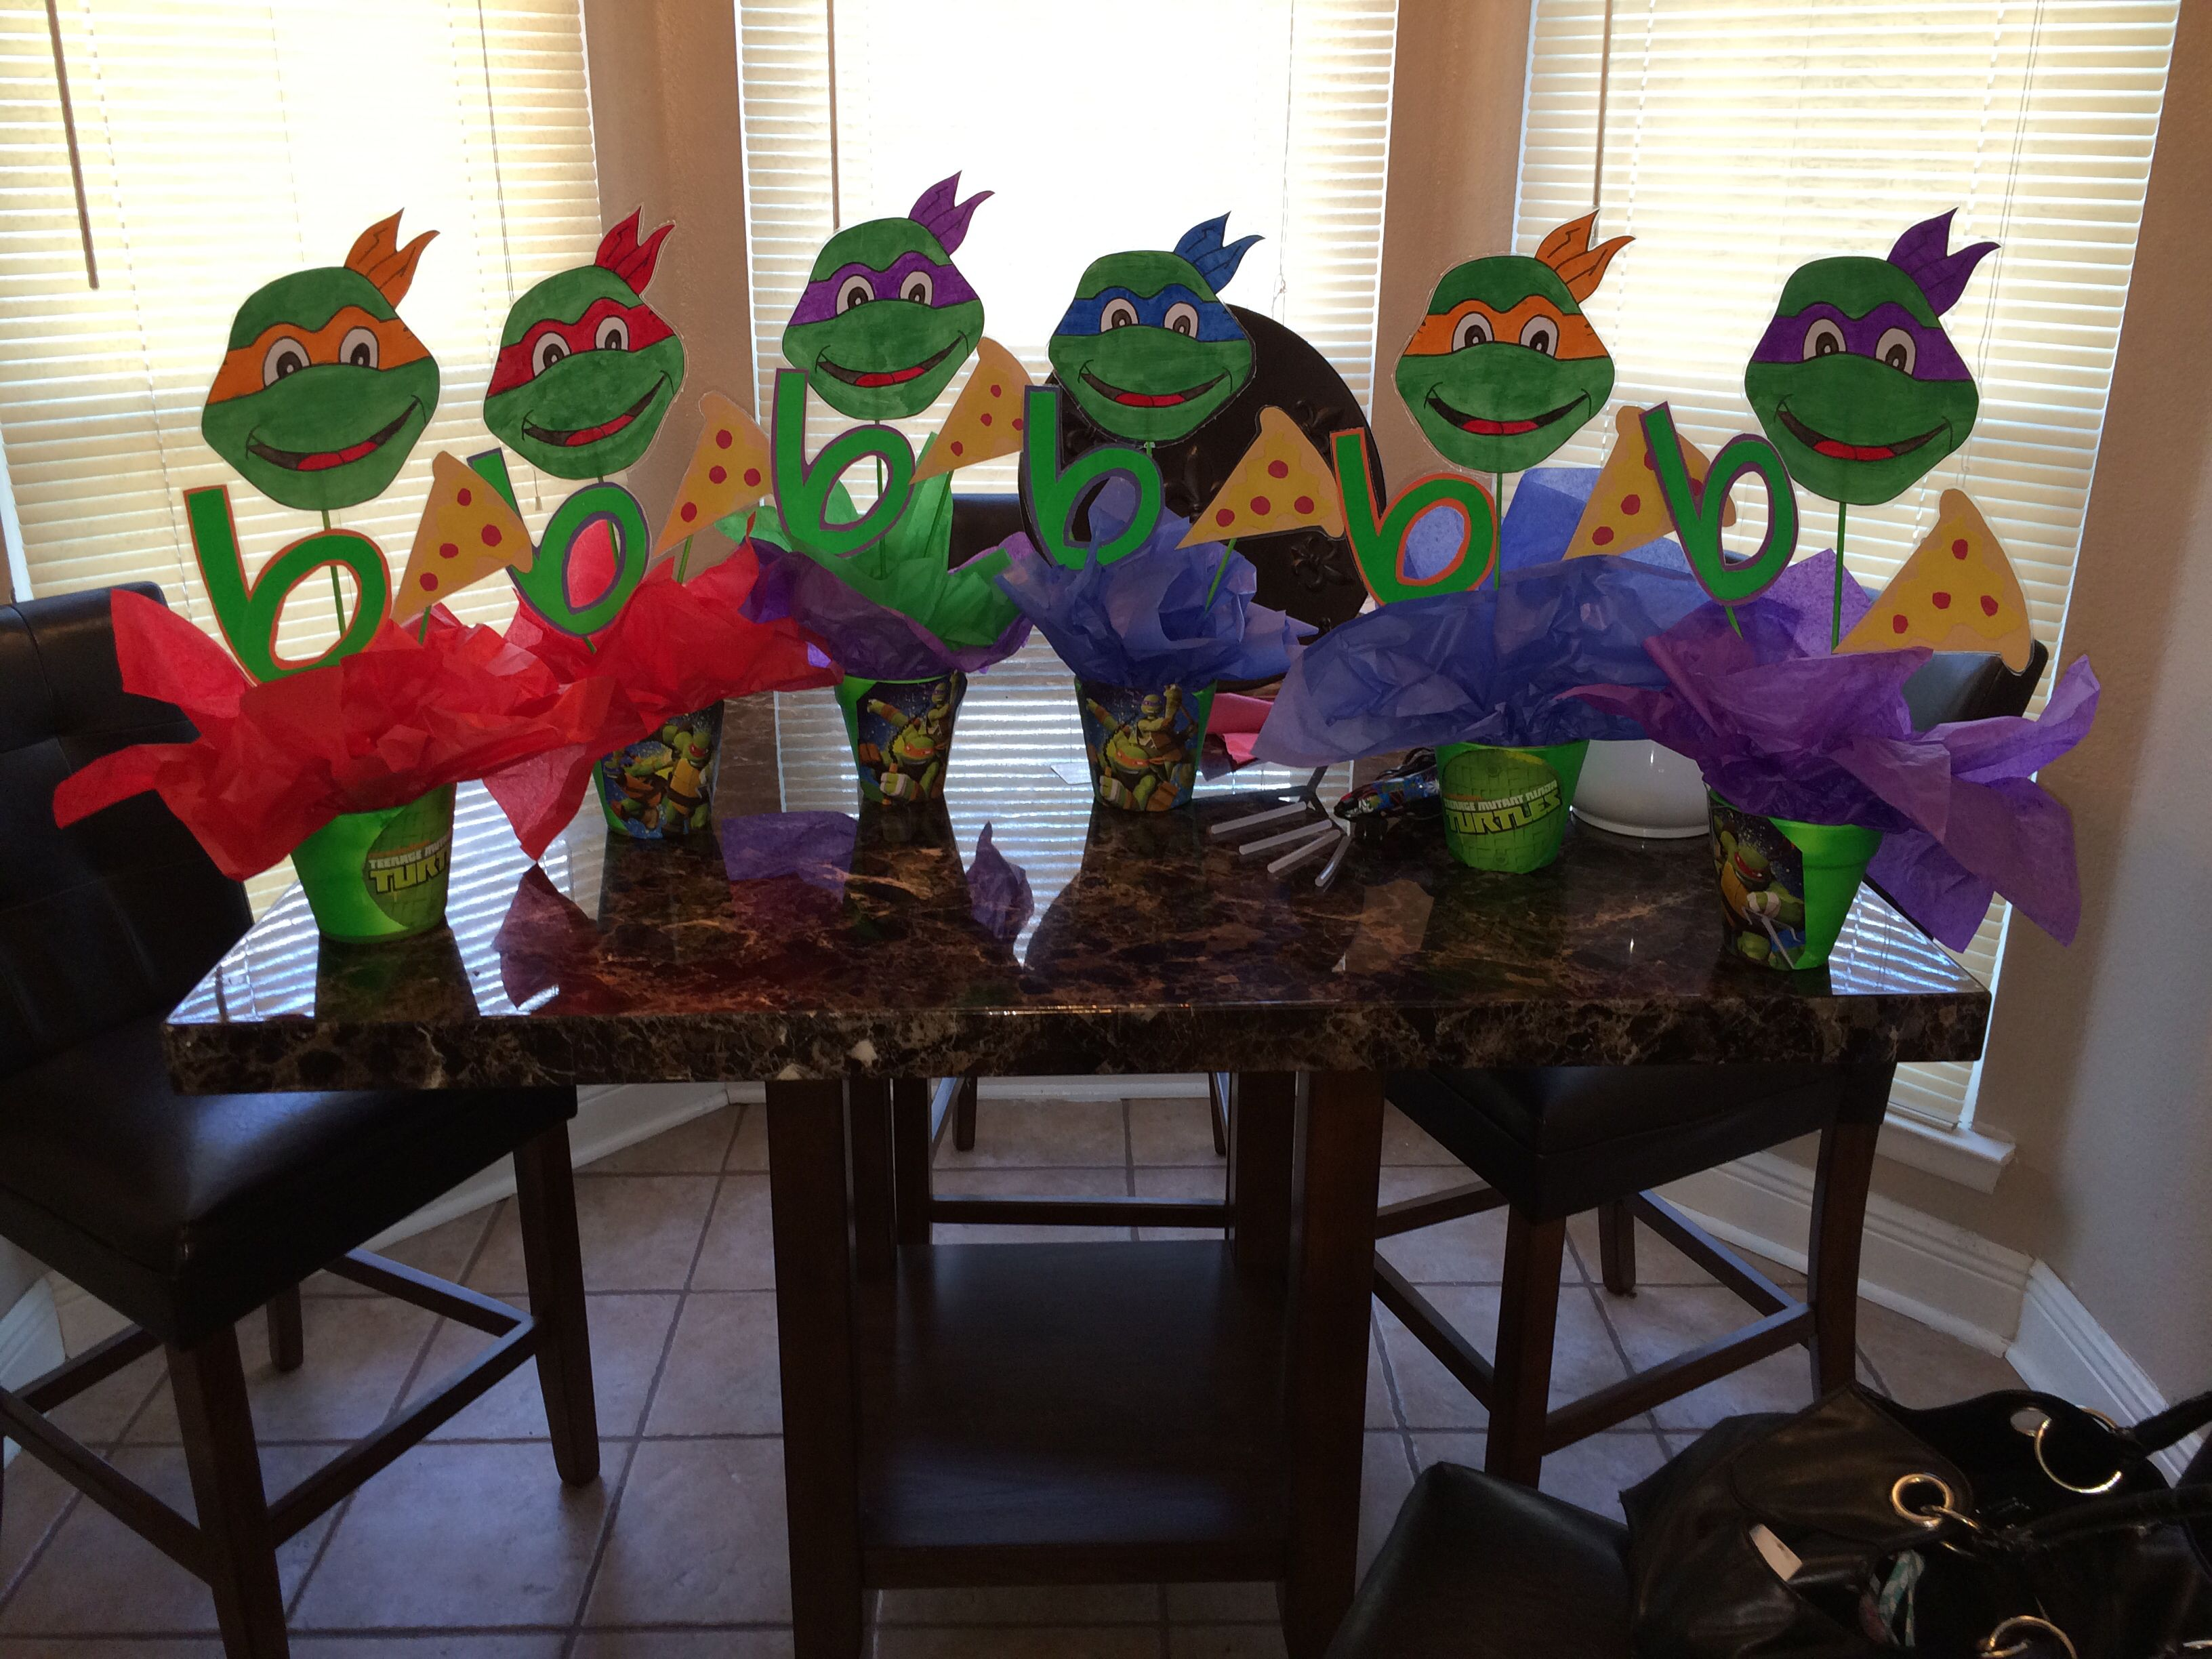 Ninja Turtle Centerpiece S Cute And Cheap Ninja Turtles Birthday Party Kids Party Centerpieces Turtle Birthday Parties